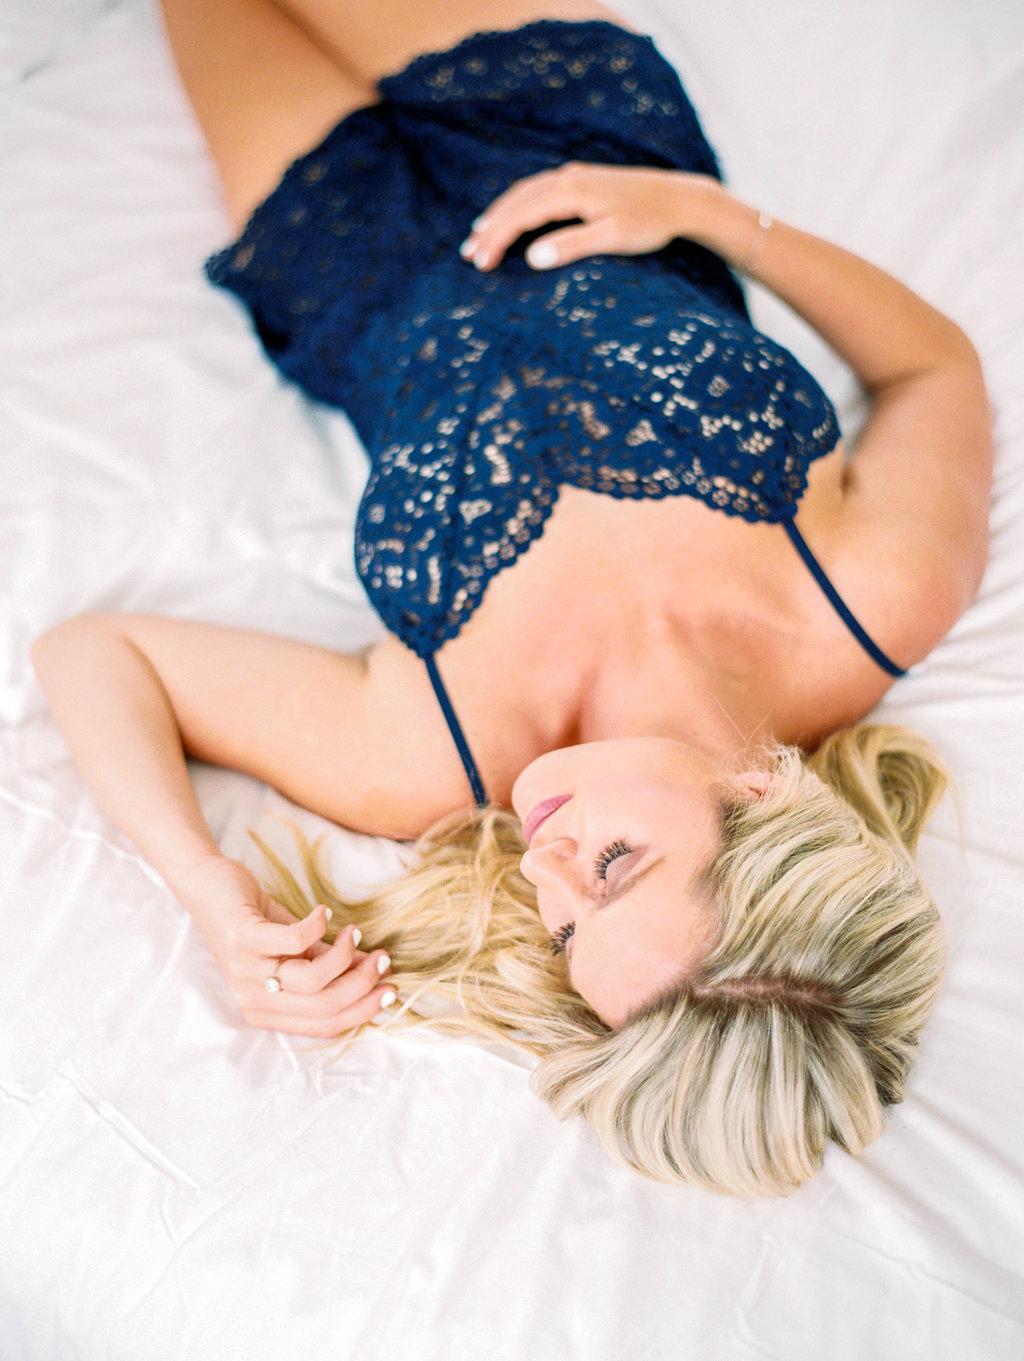 Michelle-March-Photography-IM-B-40.jpg